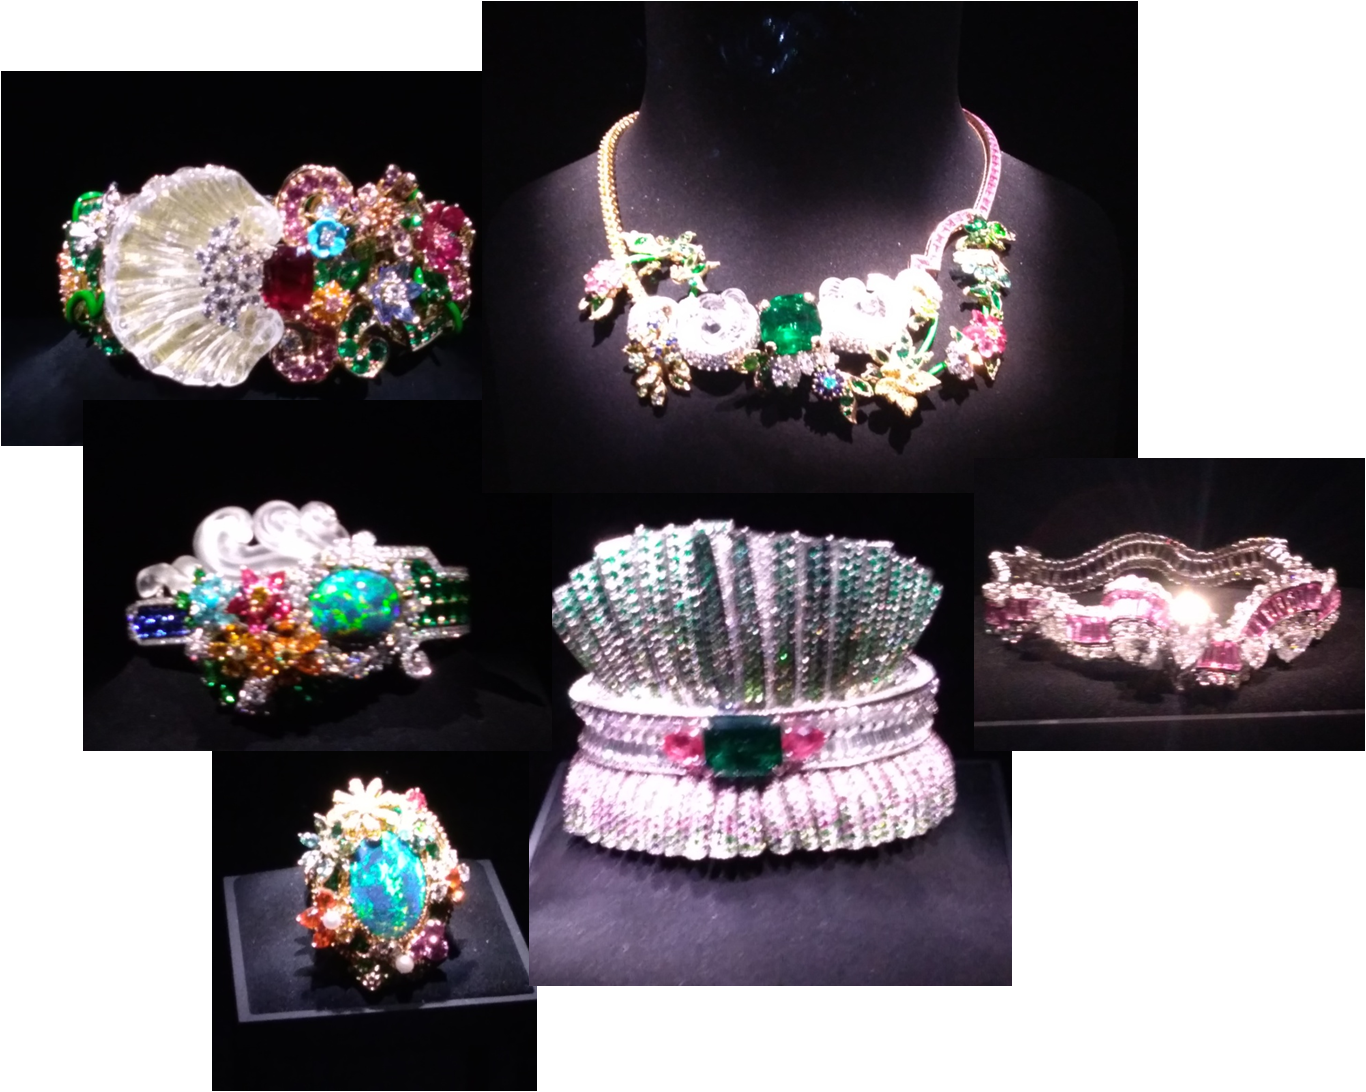 exposition Dior Dior Dior haute joaillerie